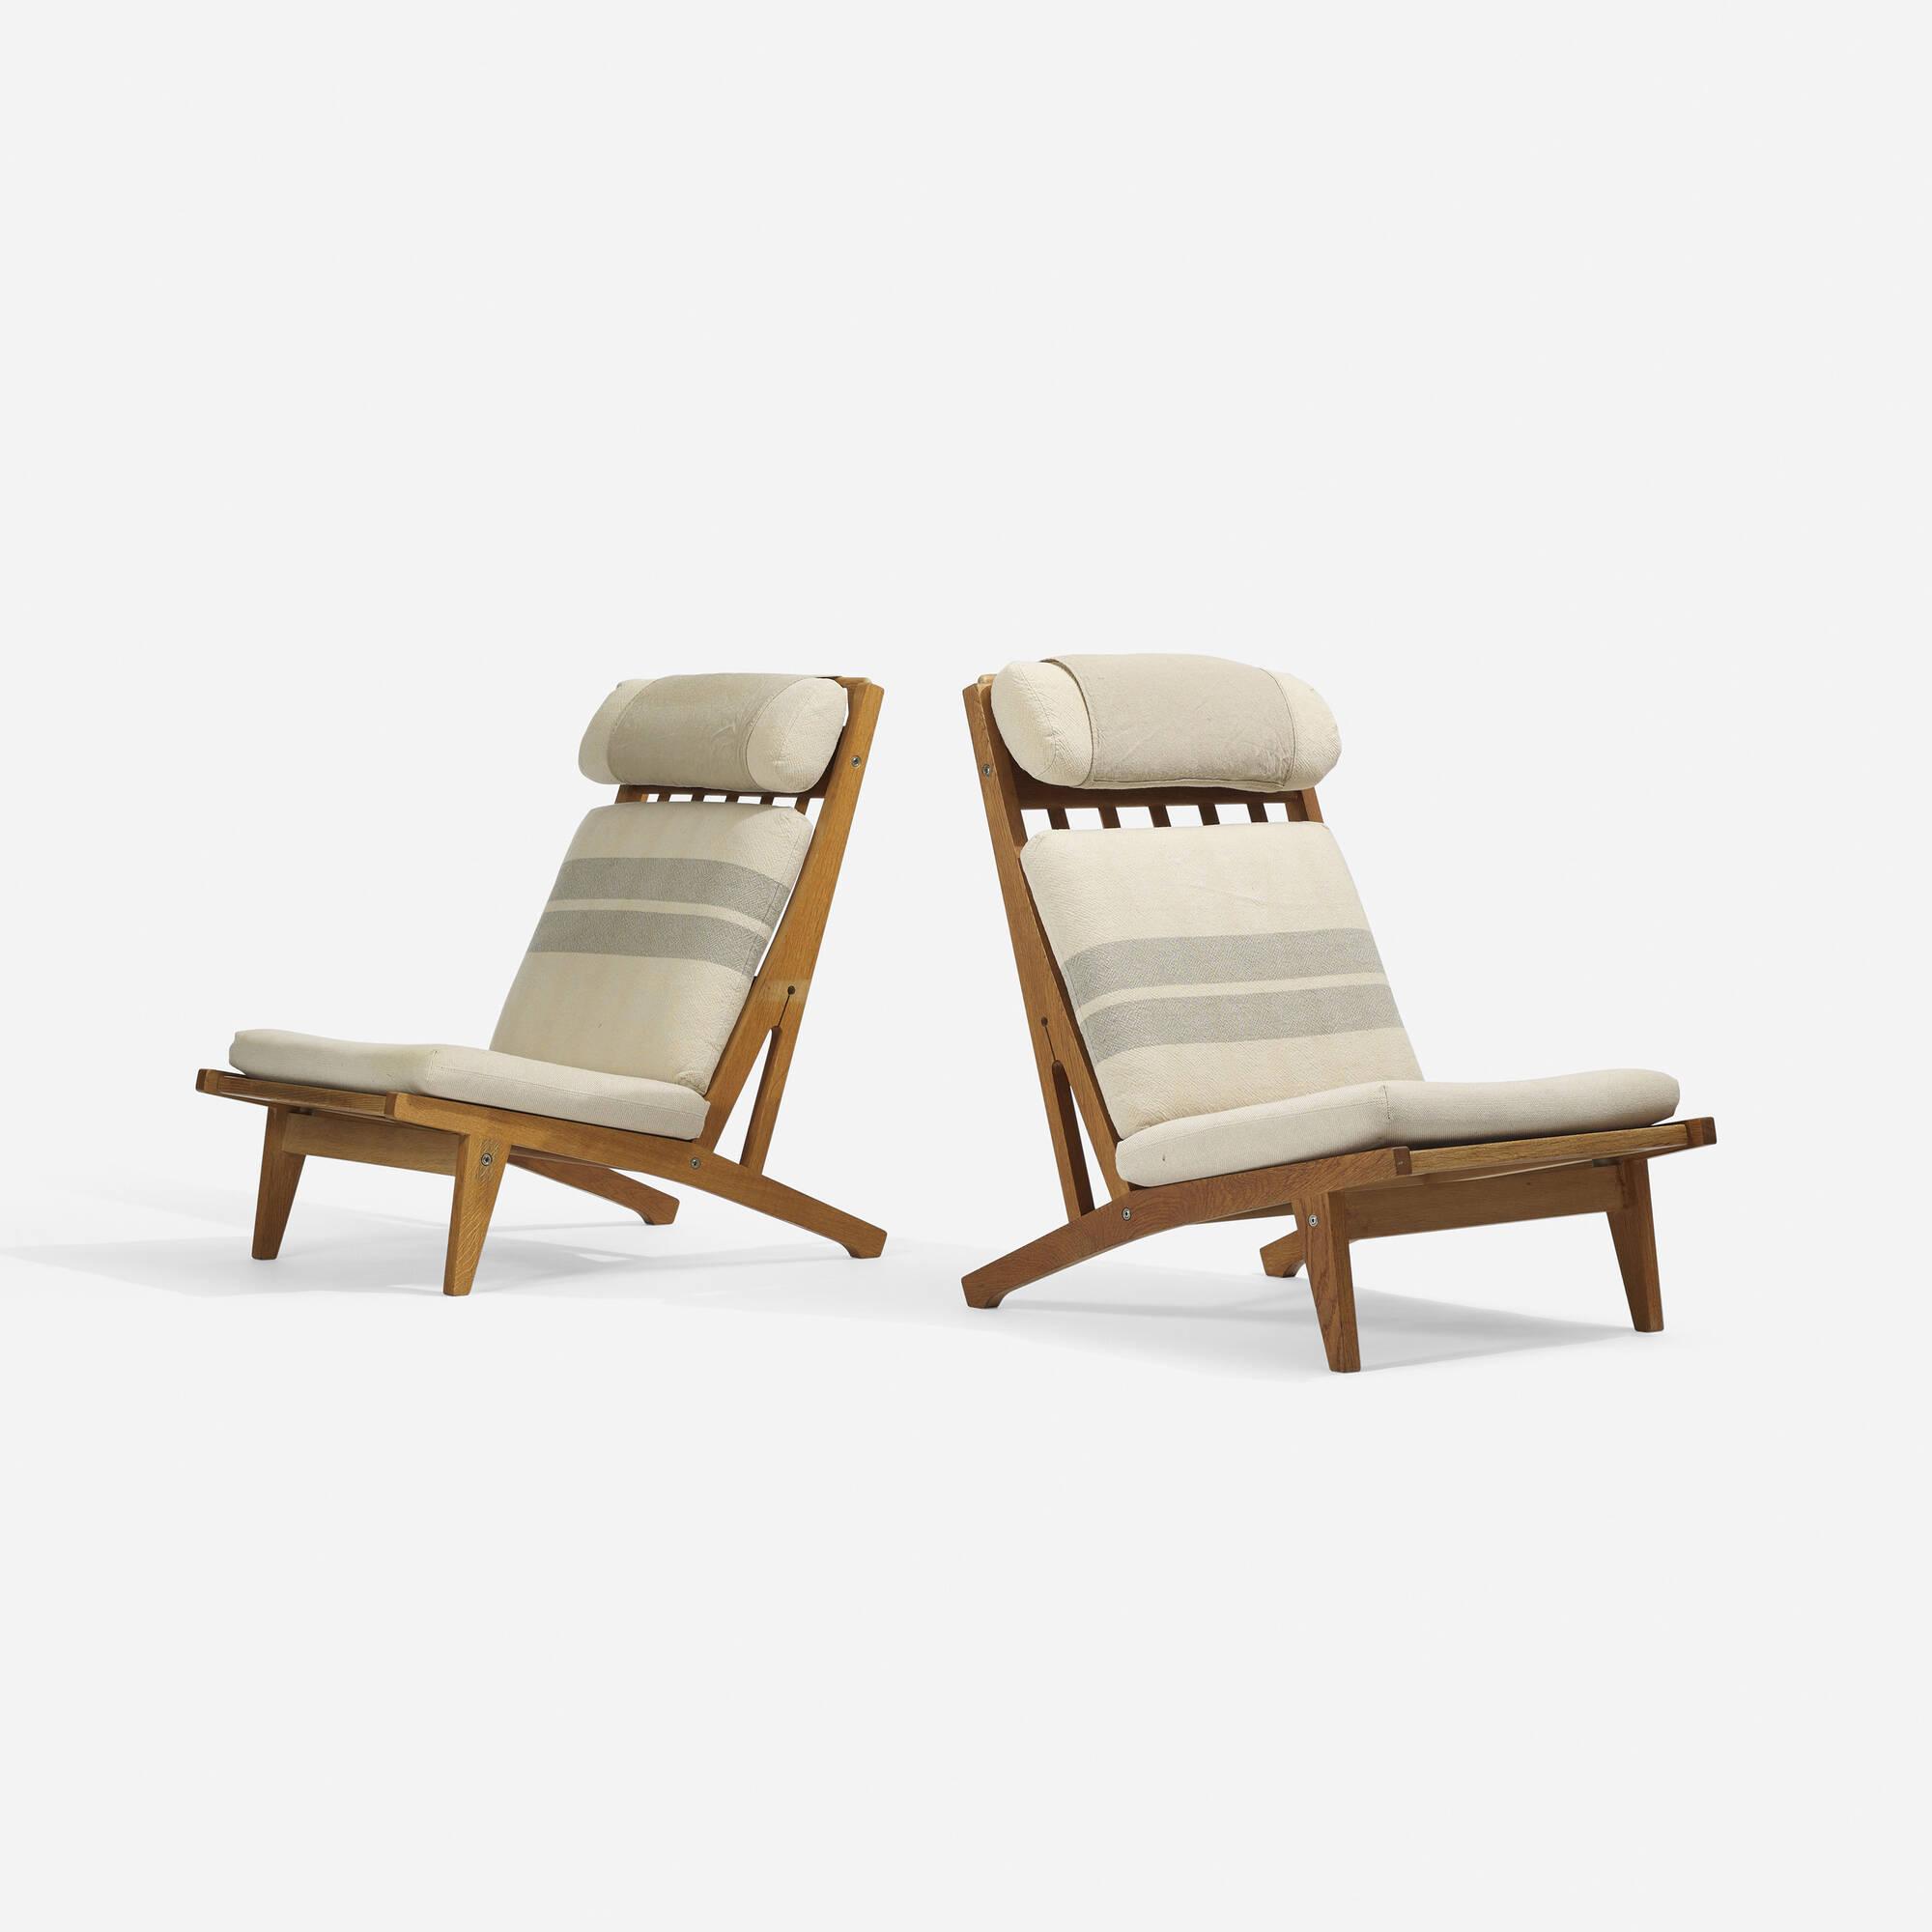 Beautiful ... 211: Hans J. Wegner / Lounge Chairs Model GE375, Pair (2 Of